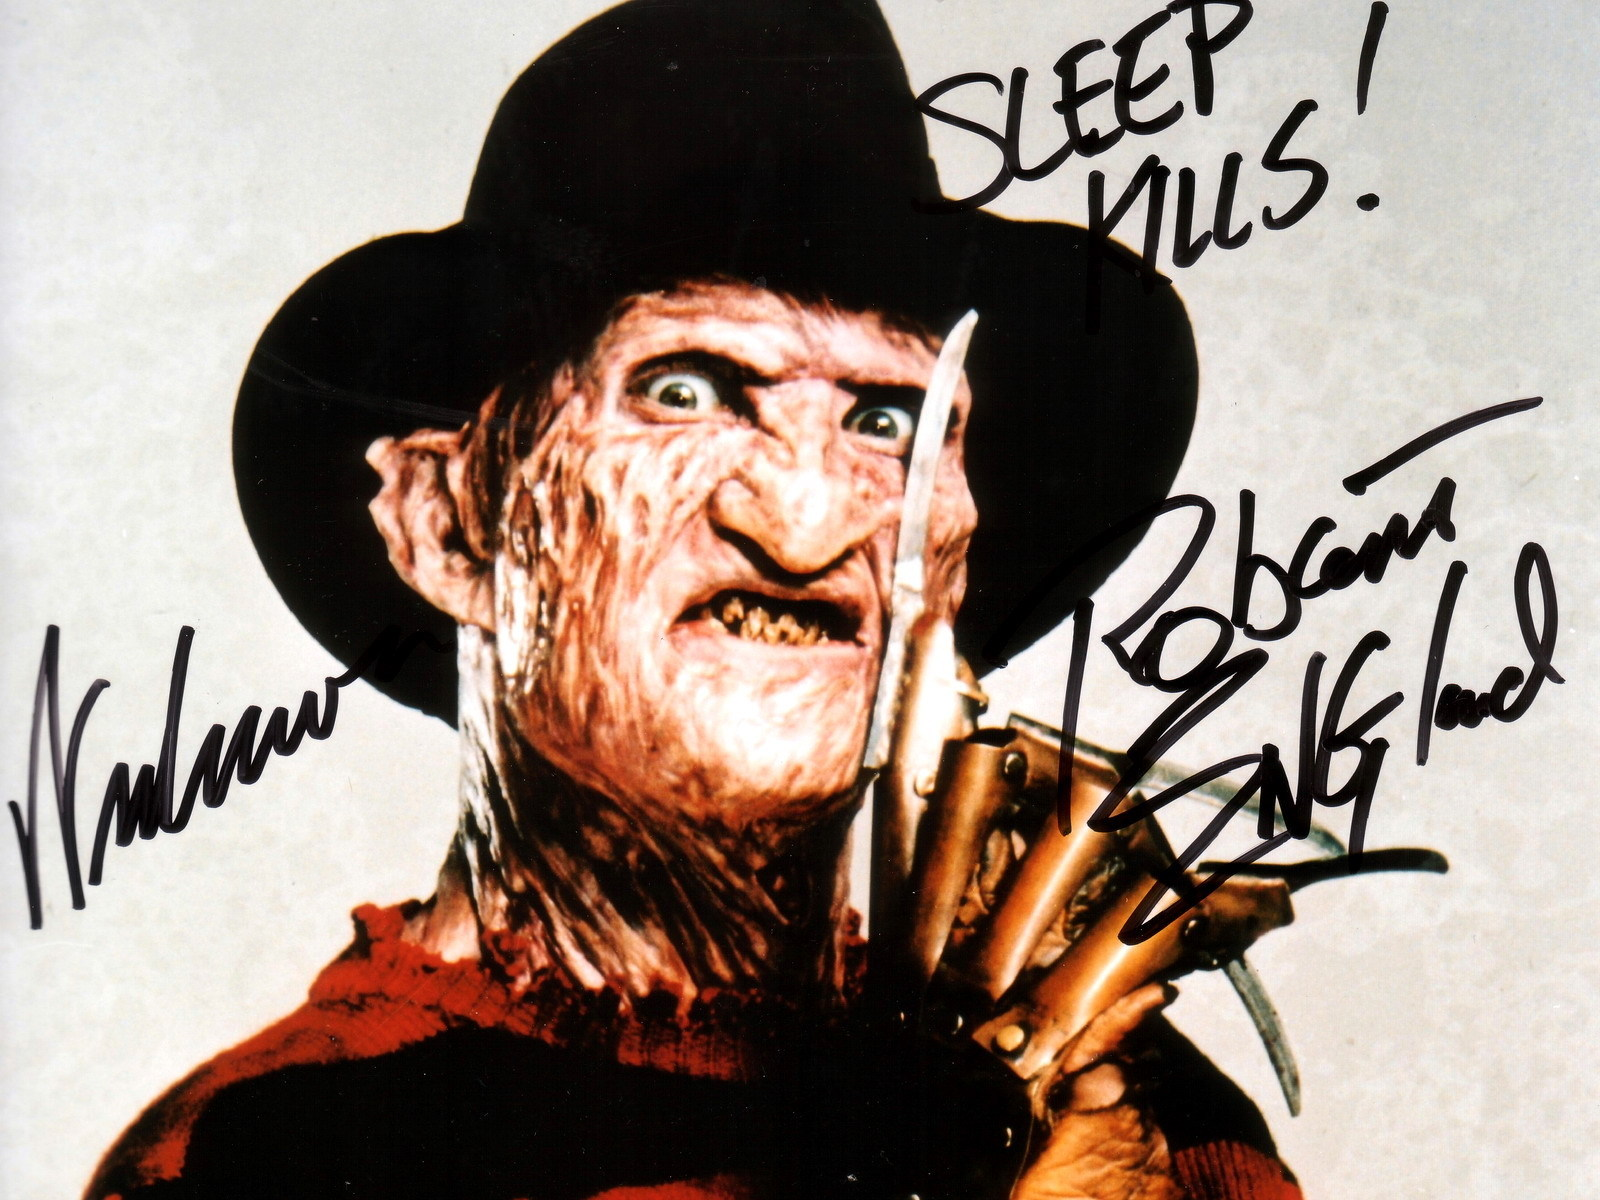 Freddy Krueger images Freddy Krueger wallpaper photos 17465606 1600x1200